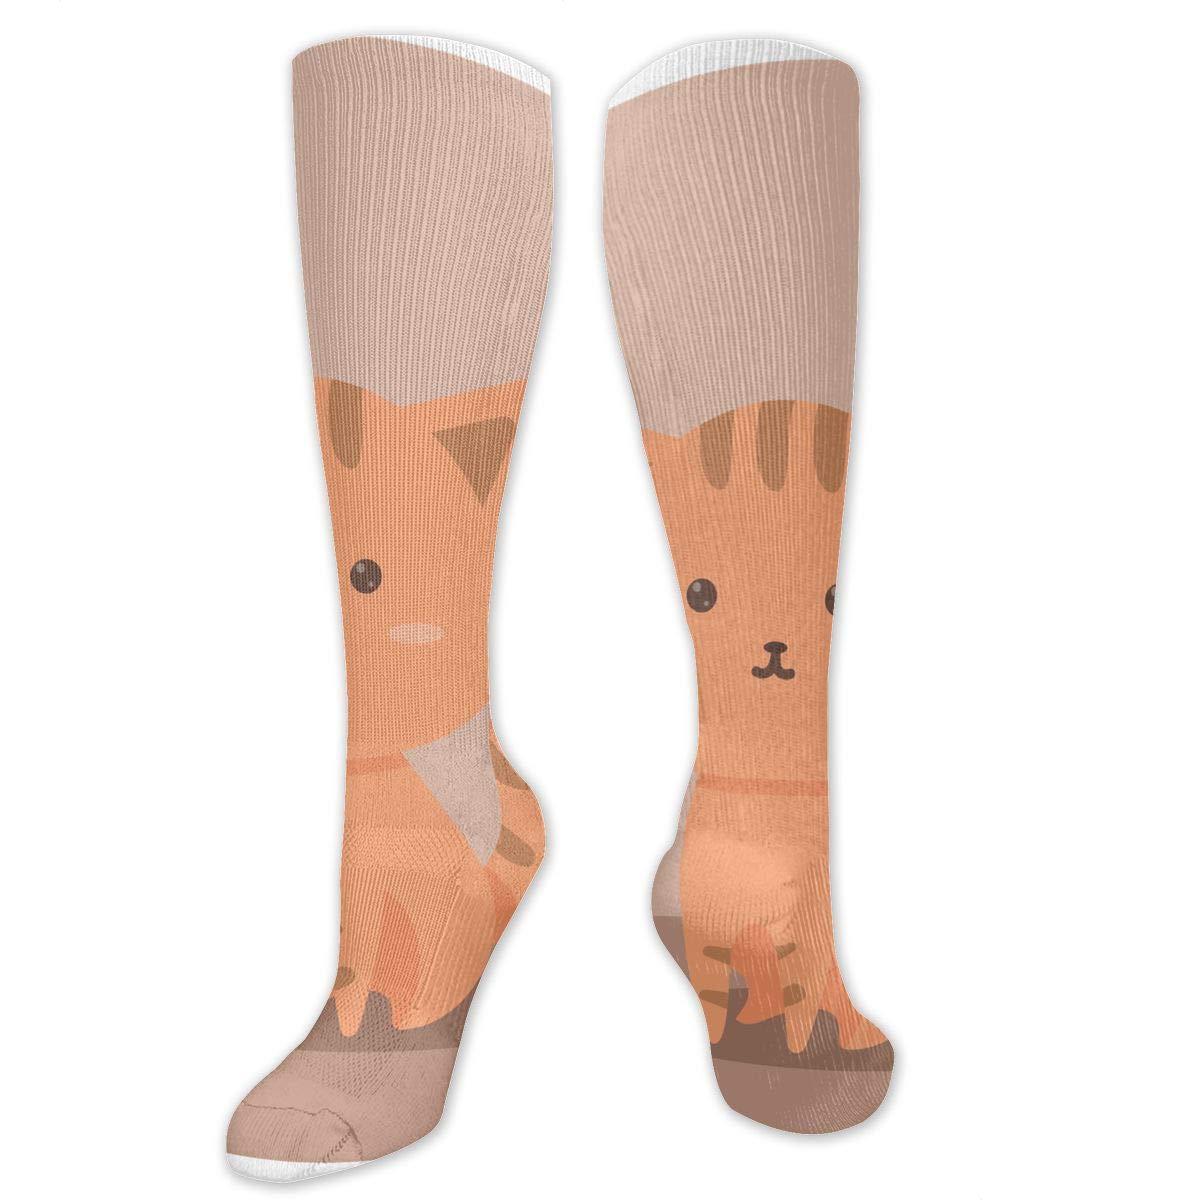 Socks Character Pattern Soccer Amazing Womens Stocking Decor Sock Clearance For Girls